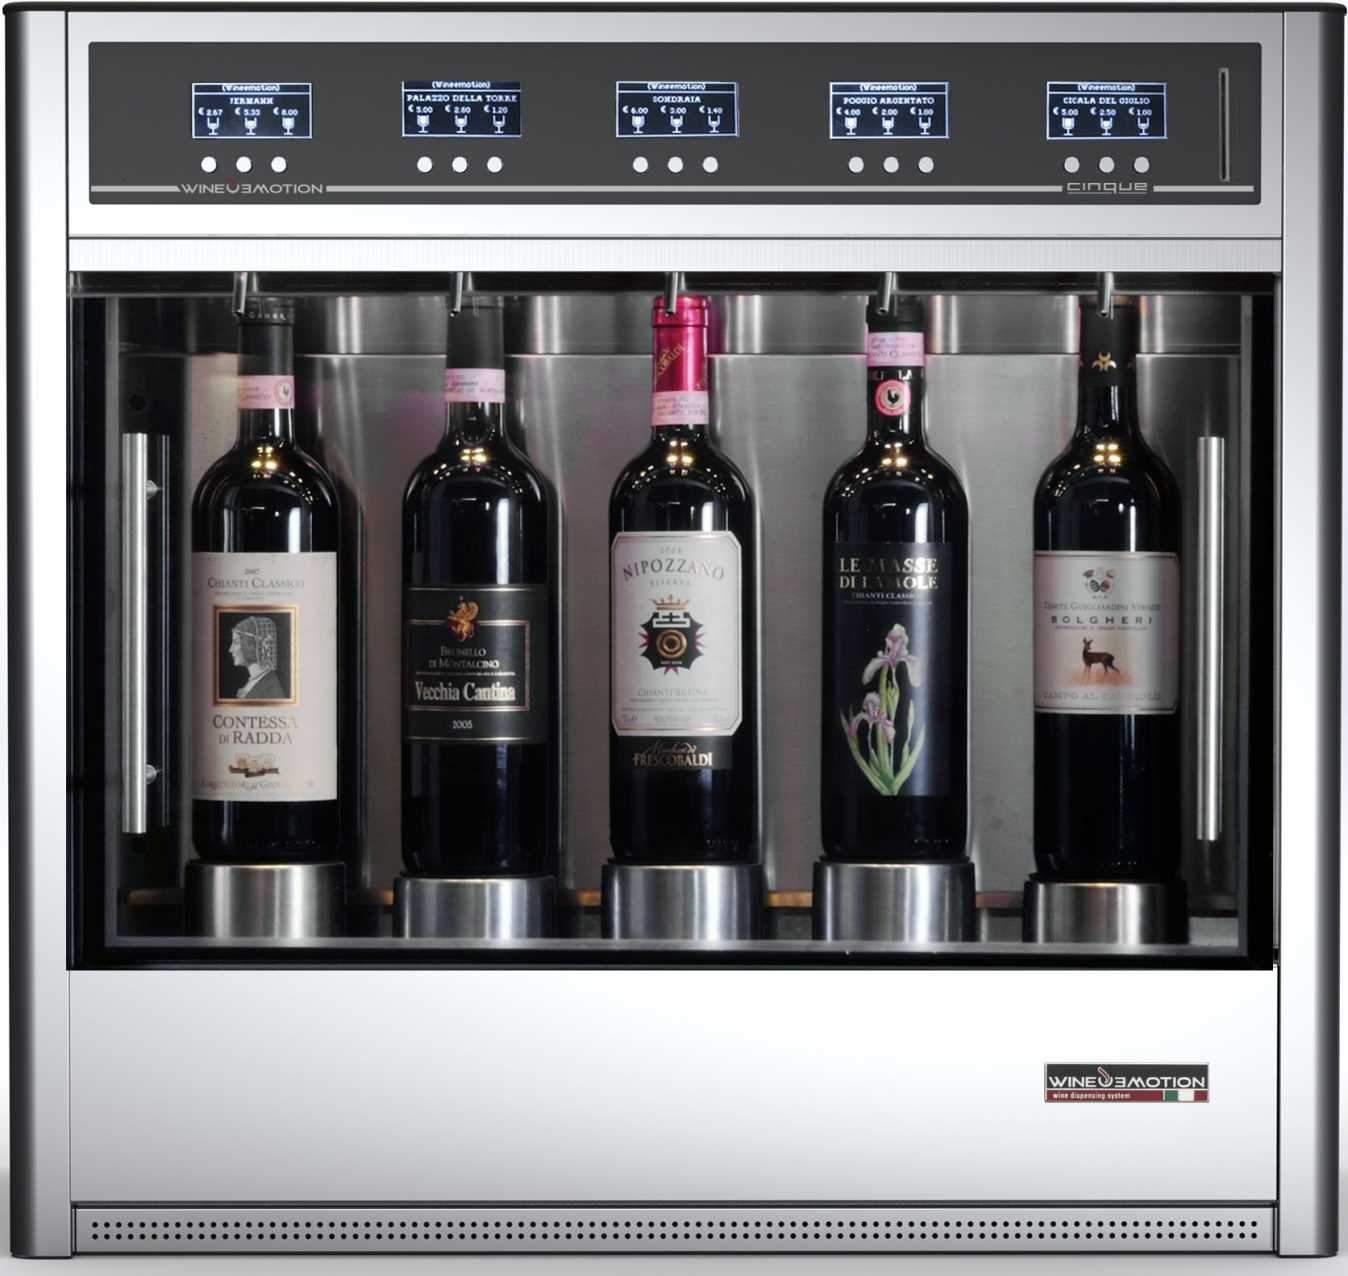 Dispensadores de vino 5 botellas por copa